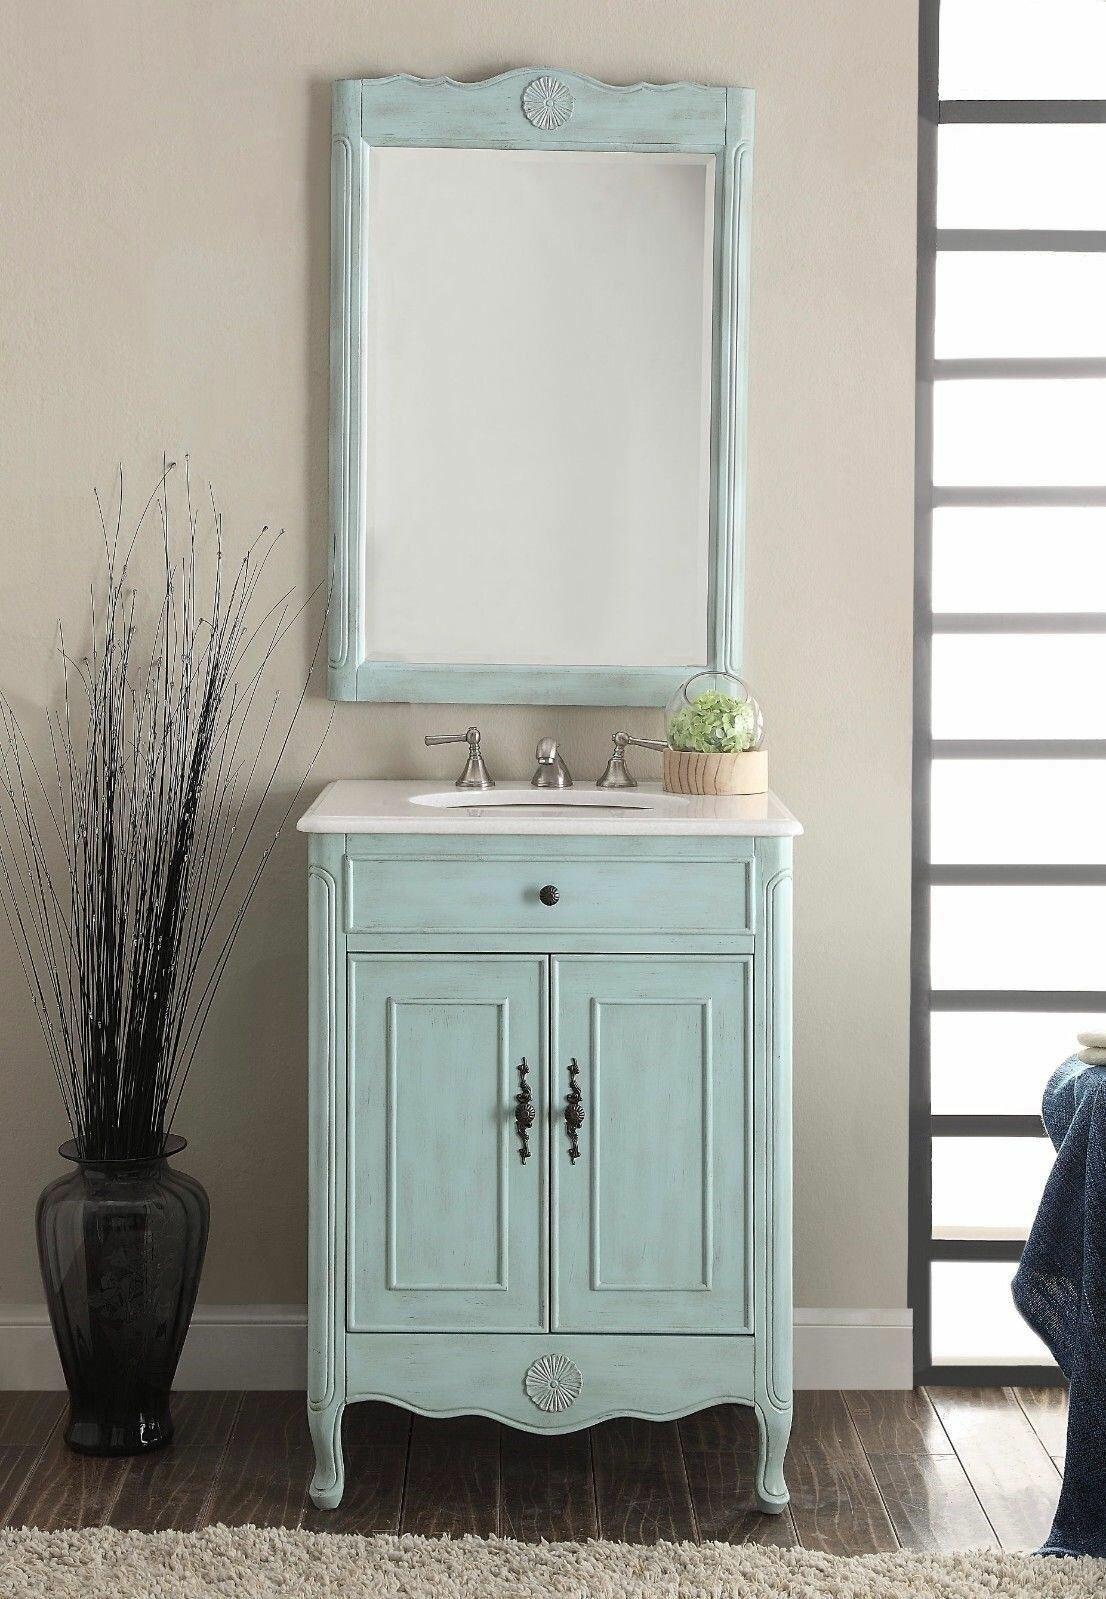 Ophelia Co Urbina 26 Single Bathroom Vanity Set With Mirror Reviews Wayfair